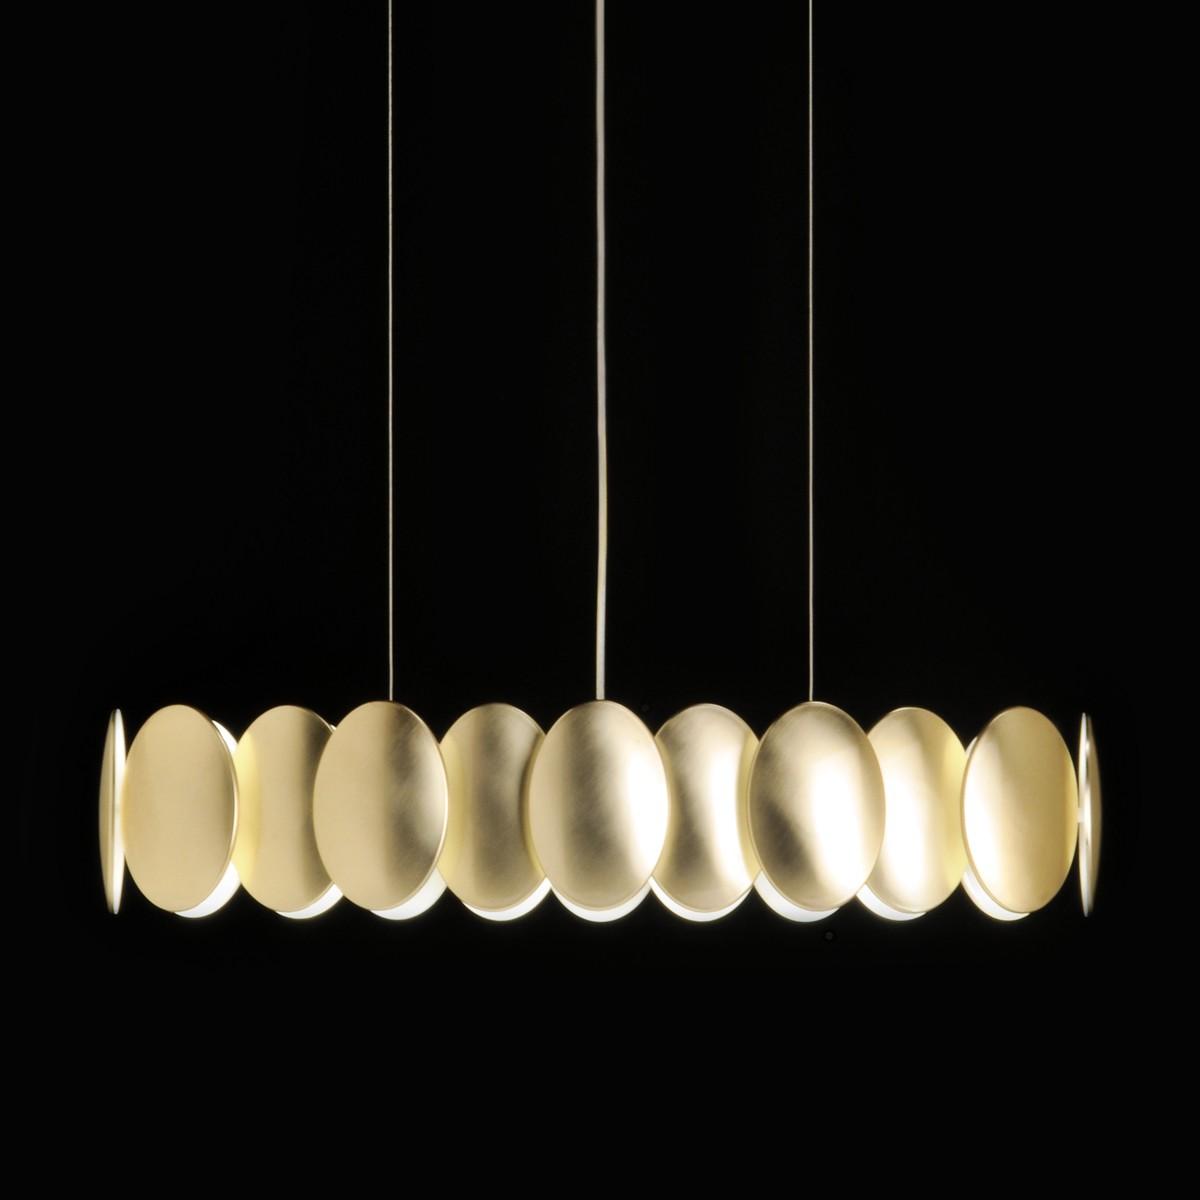 Milan Obolo Pendelleuchte, oval, Goldoptik gebürstet